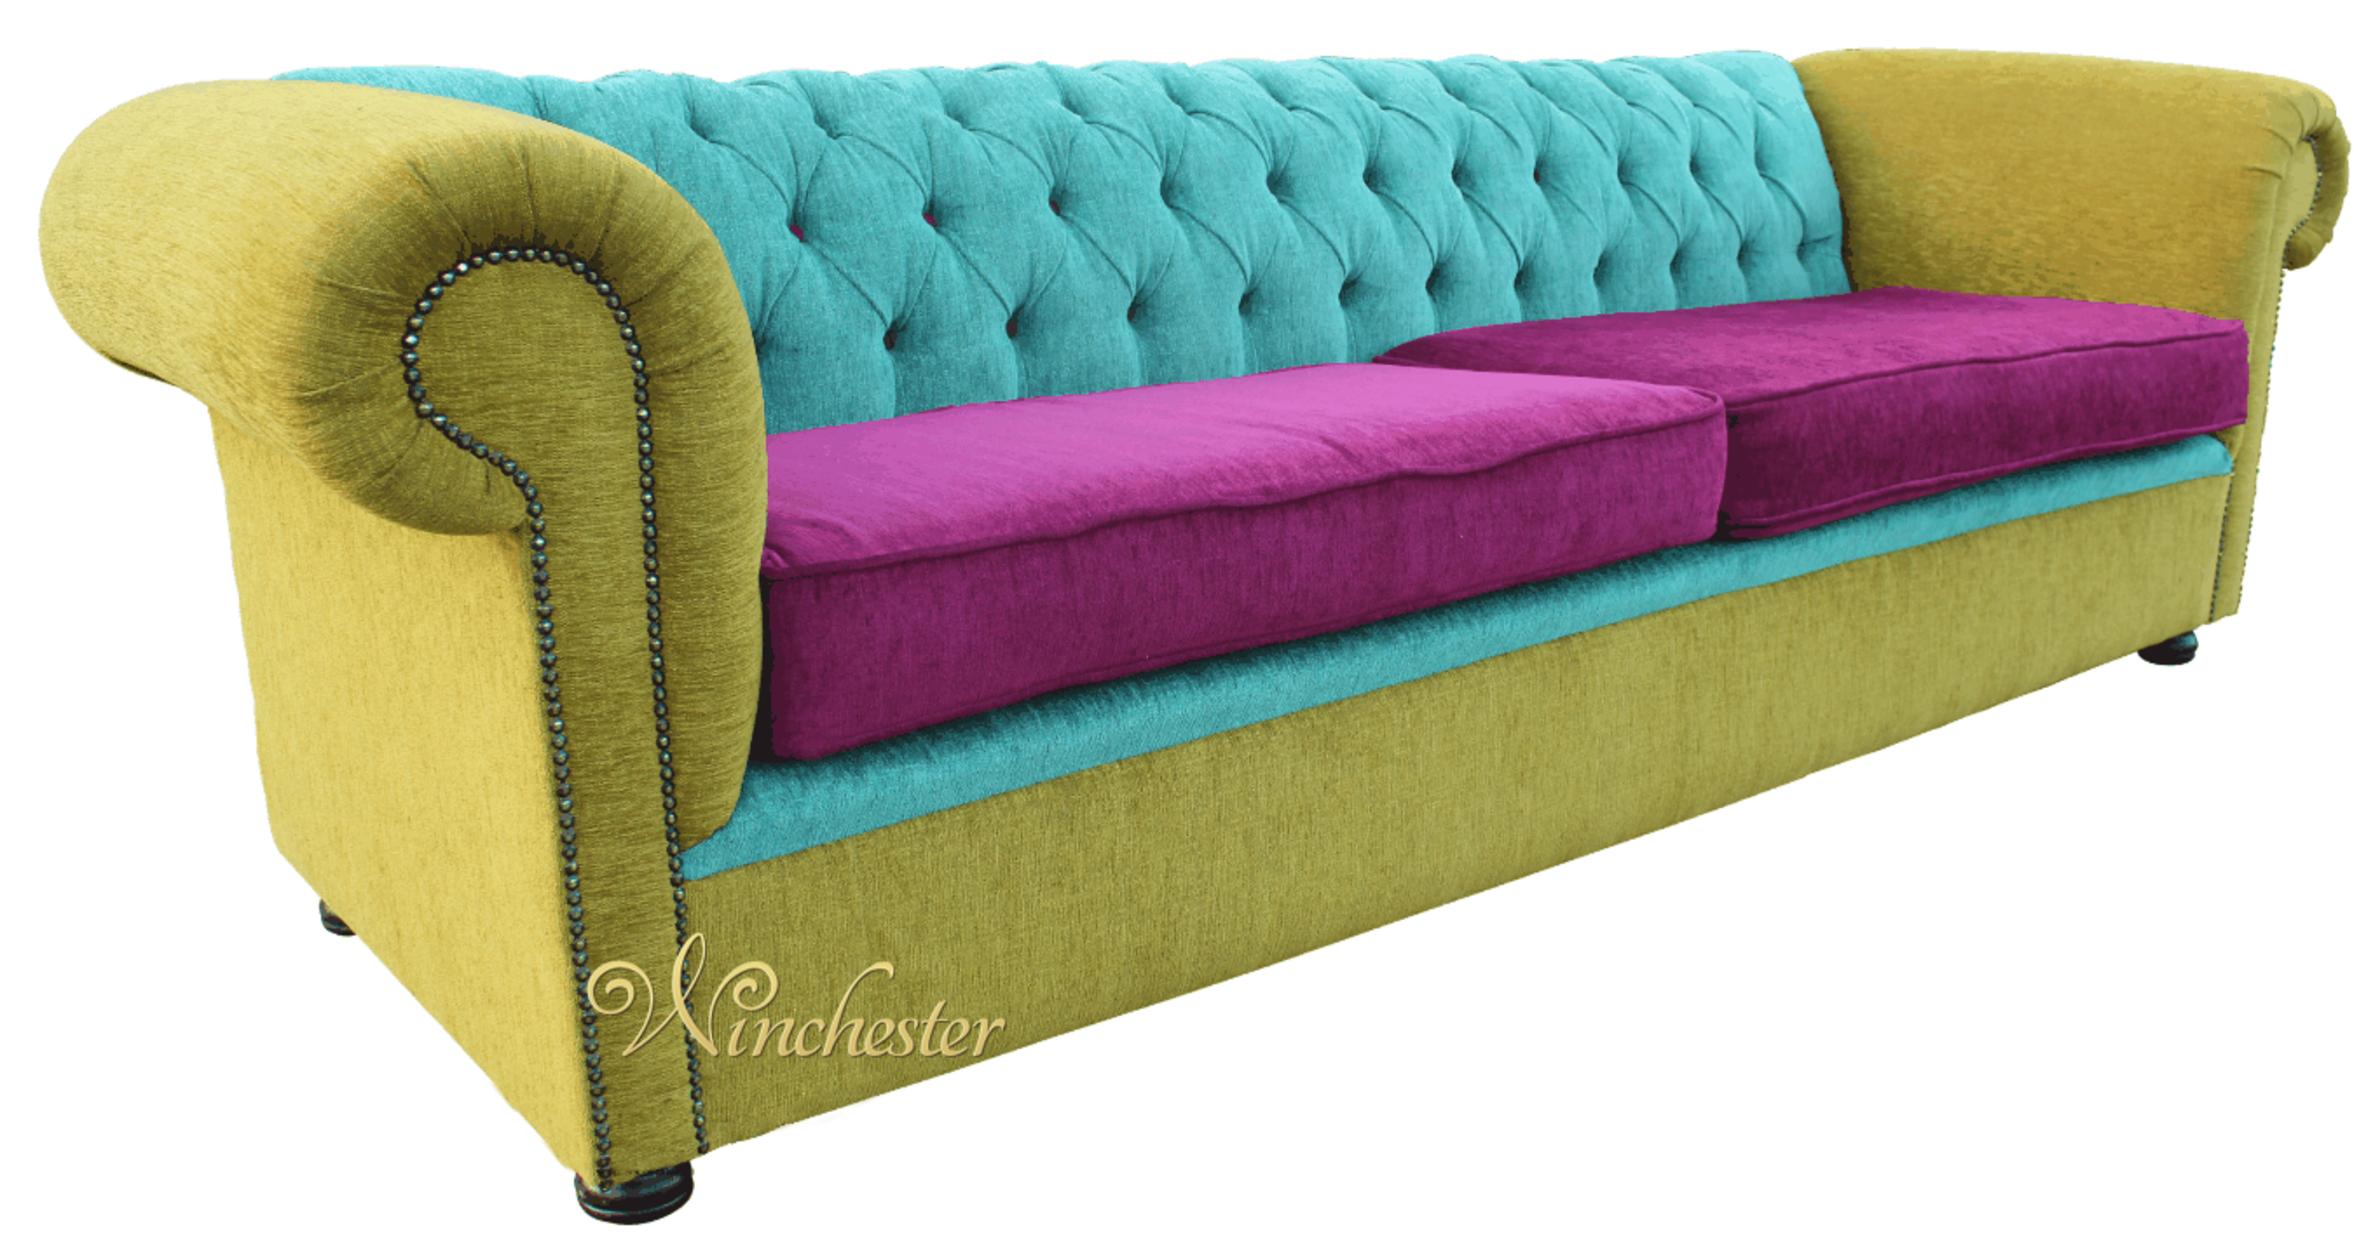 chesterfield 4 seater settee sofa bespoke fabric lime aubergine. Black Bedroom Furniture Sets. Home Design Ideas